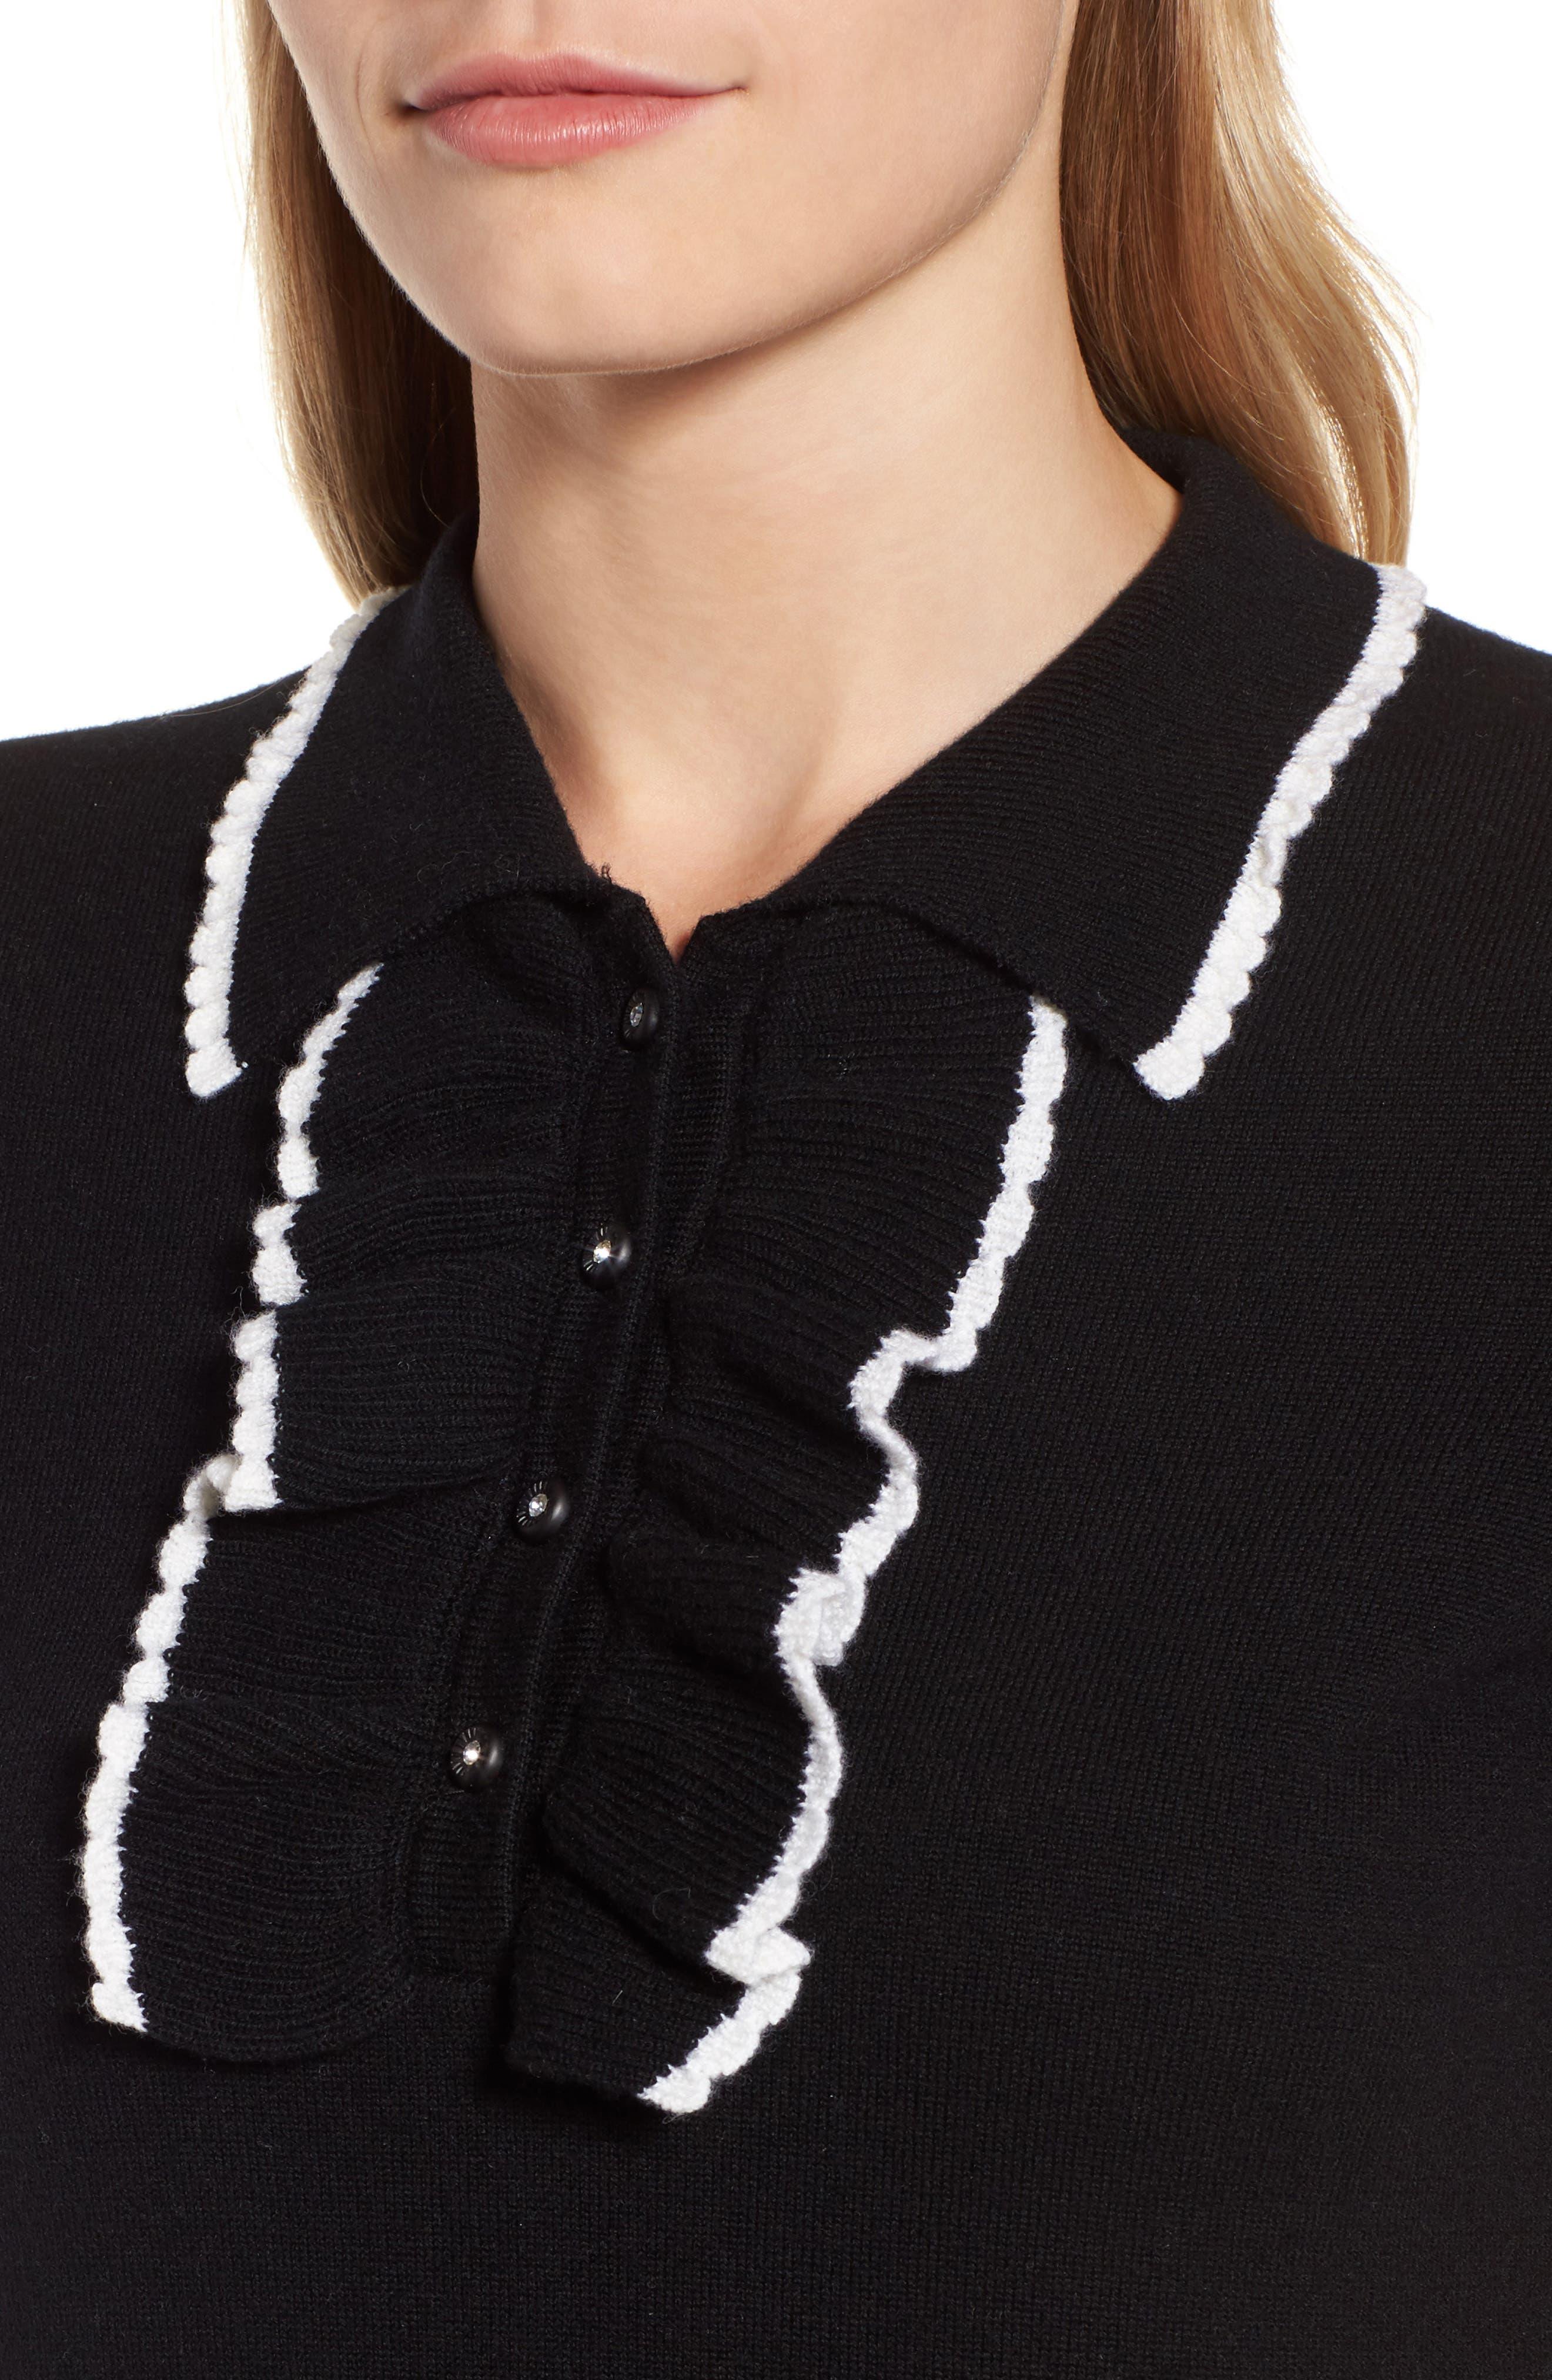 Polo Sweater Dress,                             Alternate thumbnail 4, color,                             001